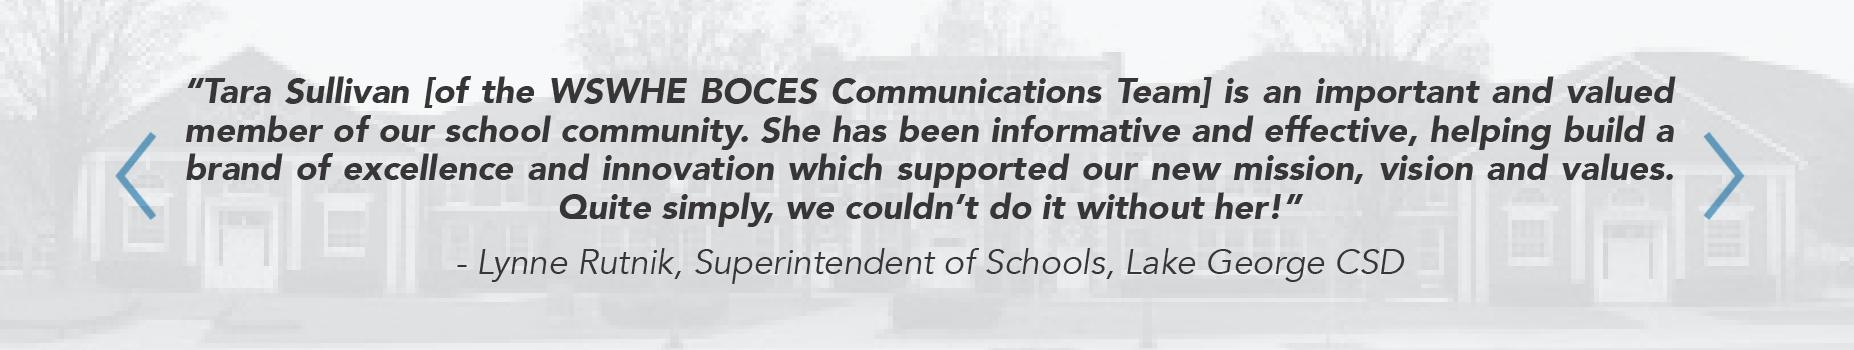 Communications Team testimonials